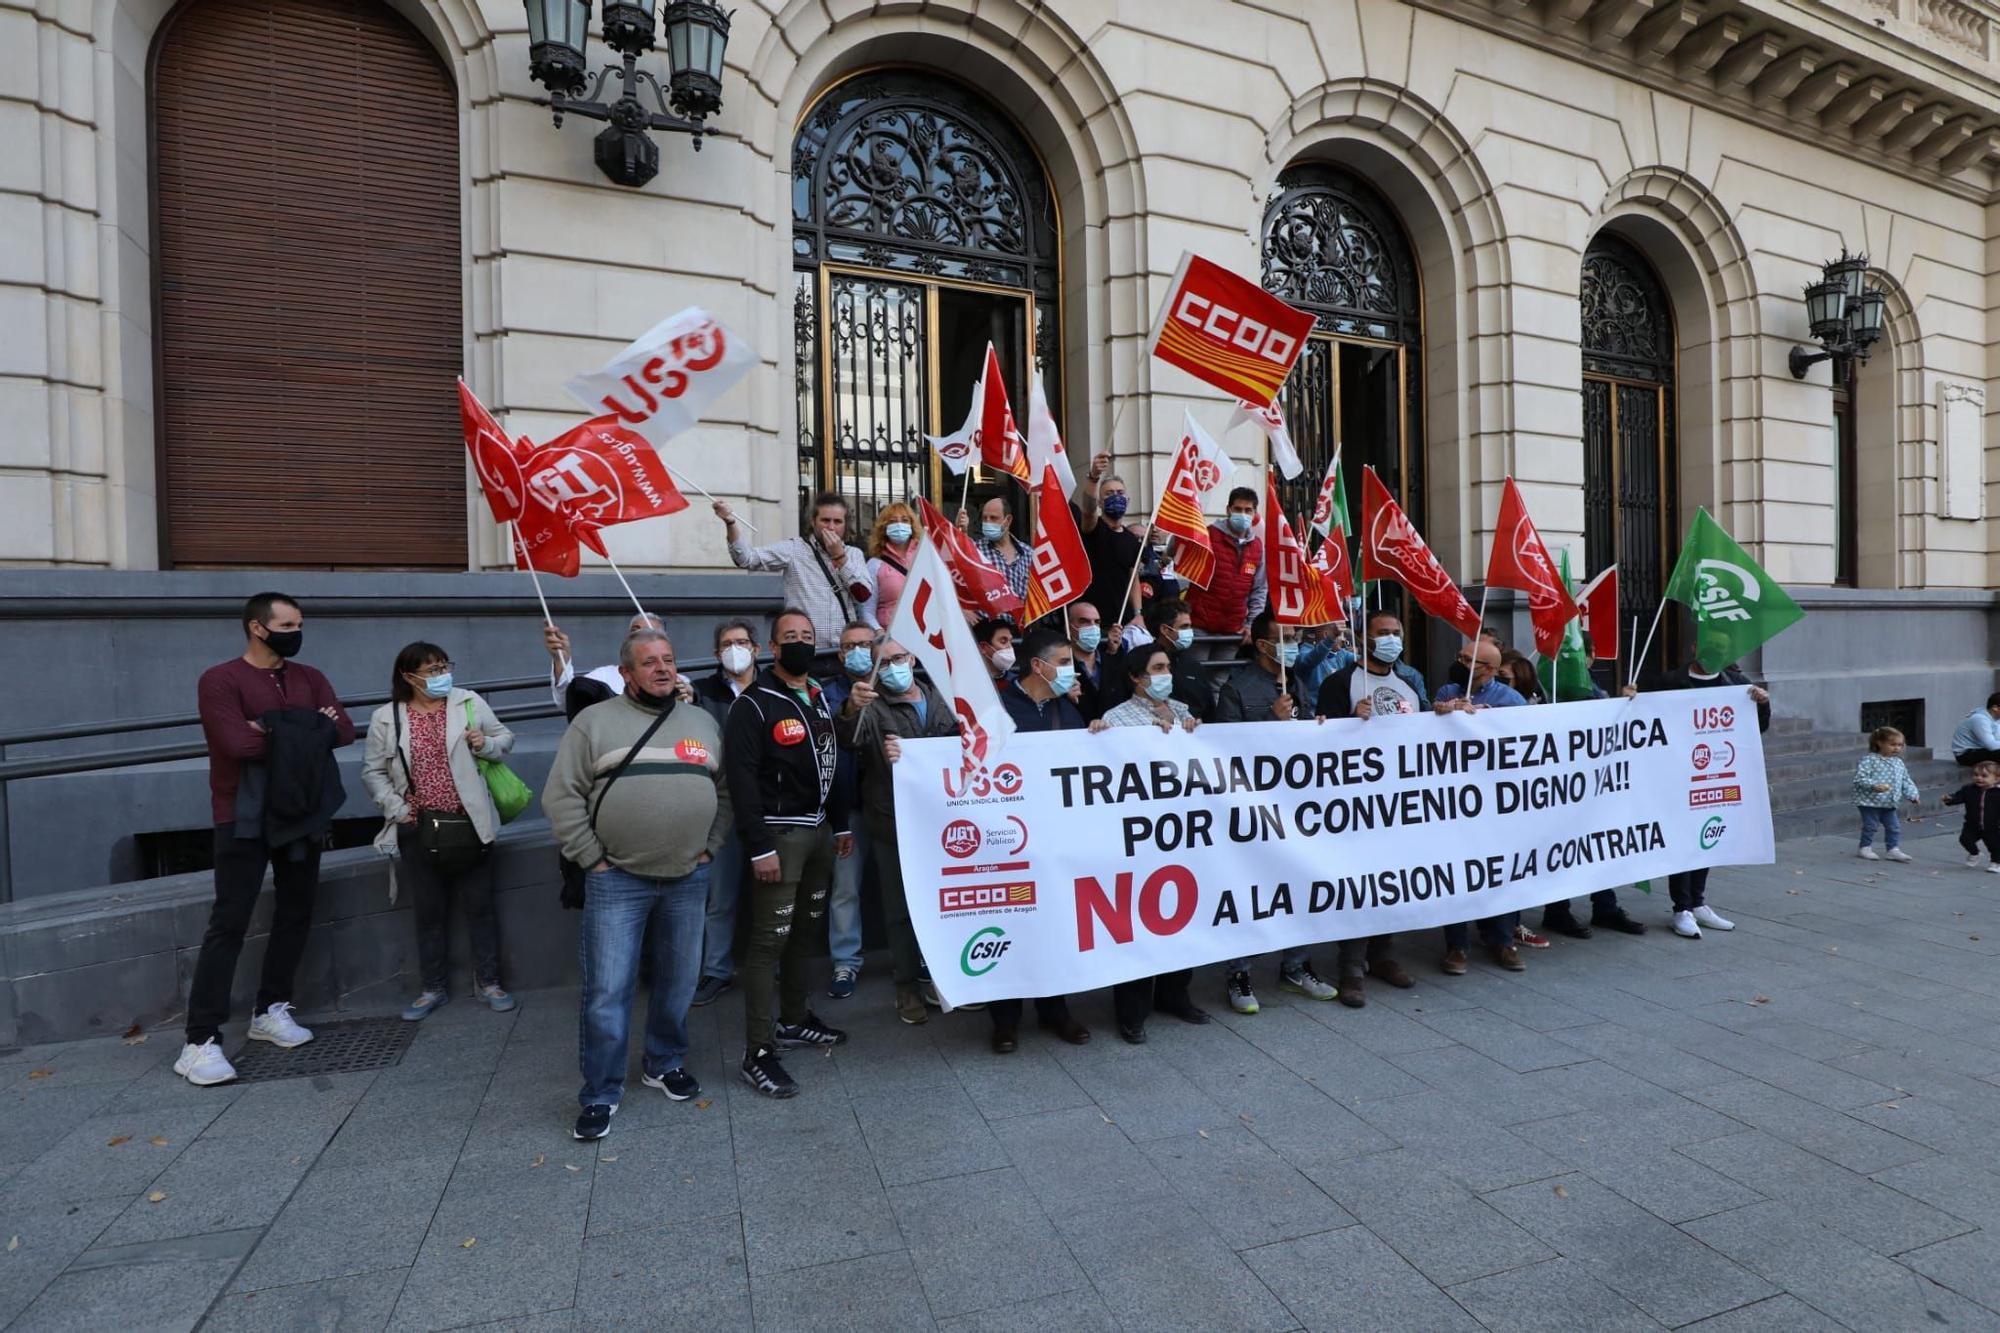 Tarde de protestas en Zaragoza